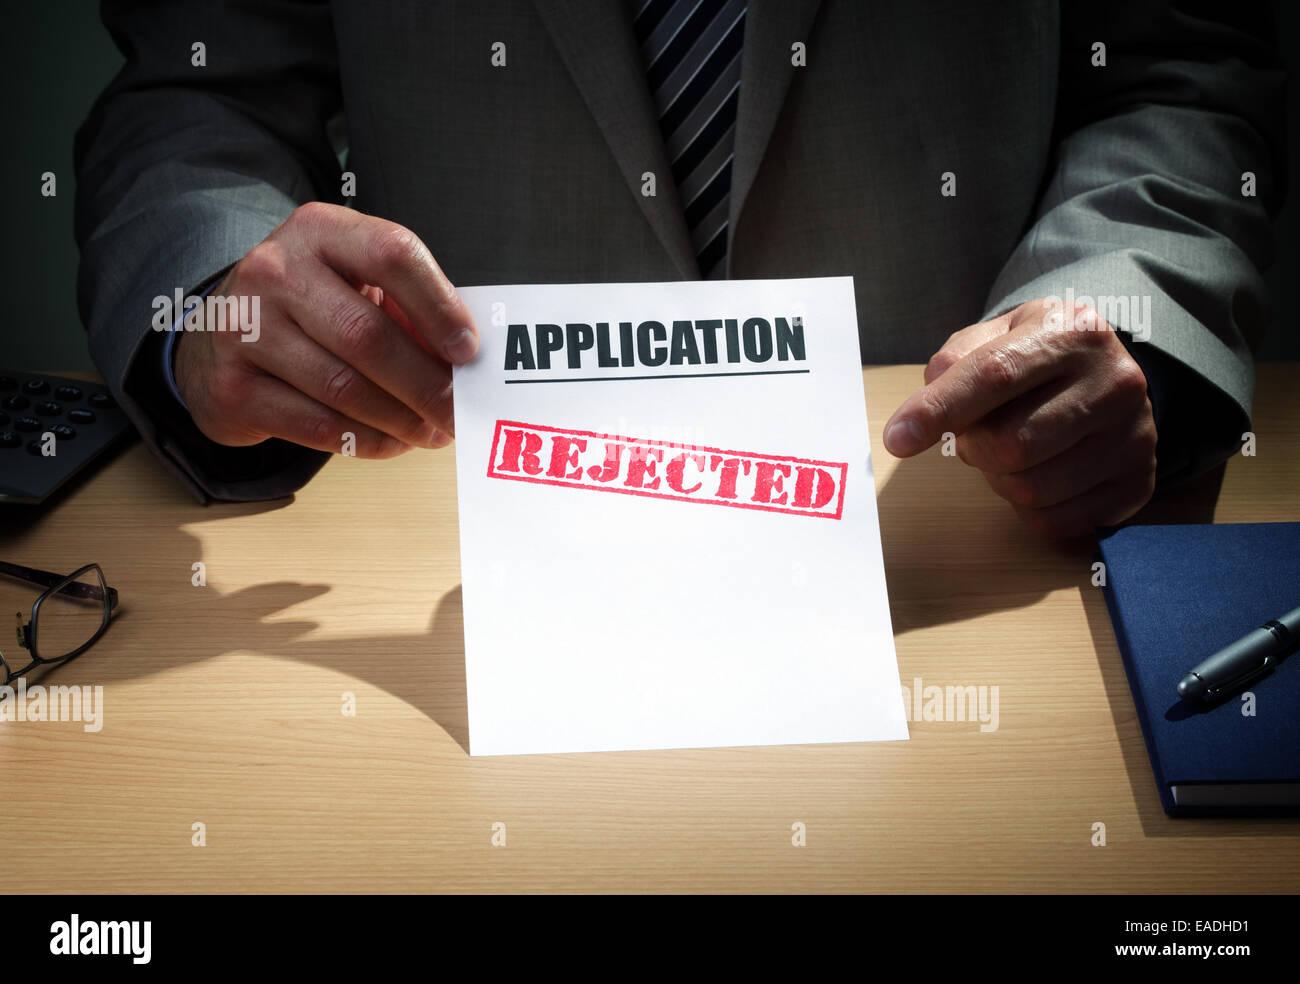 Demande rejetée Photo Stock